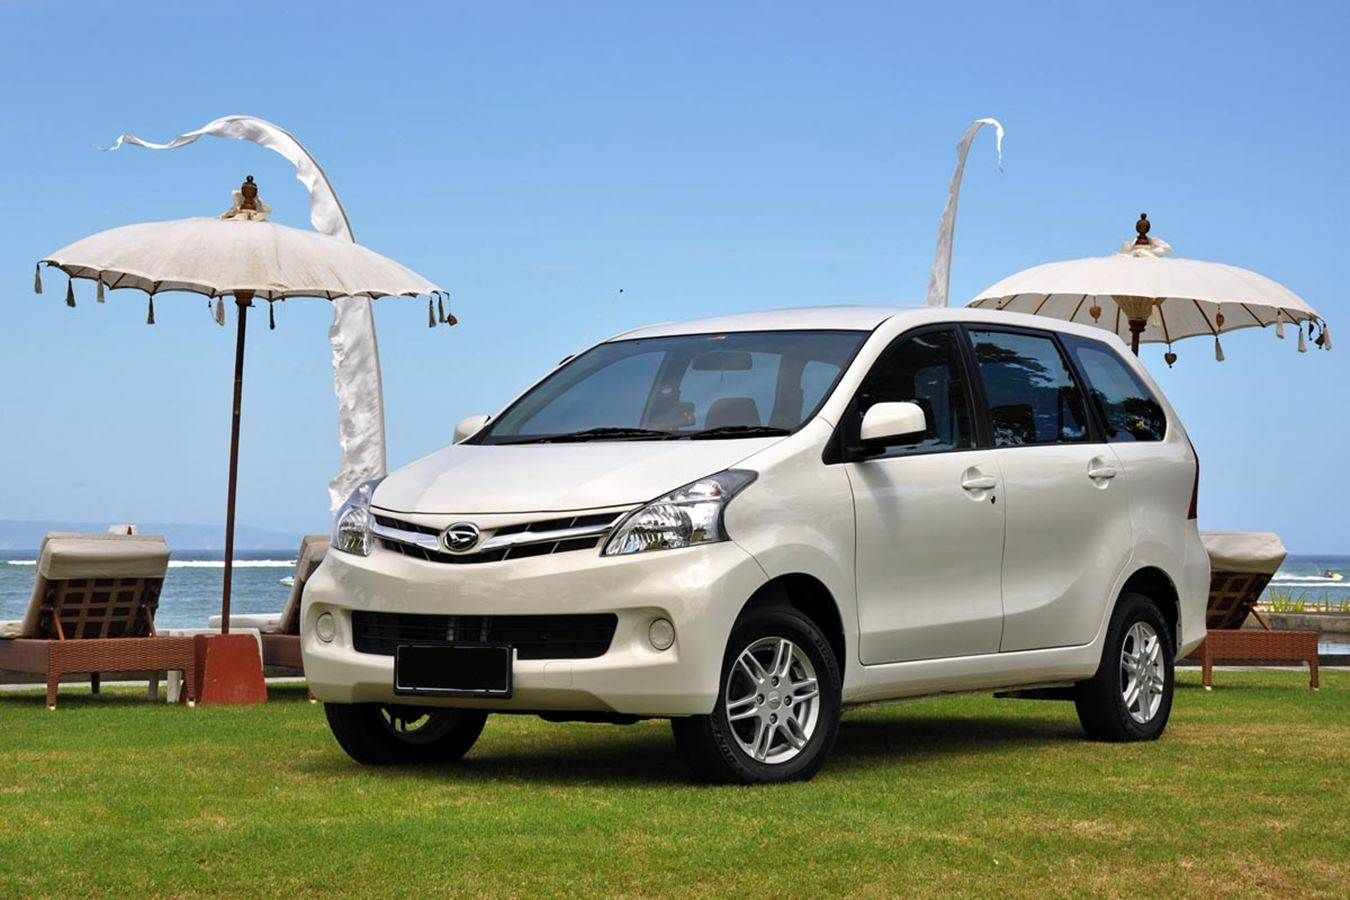 Perdana Jaya Travel is a Tour and Travel company strife to